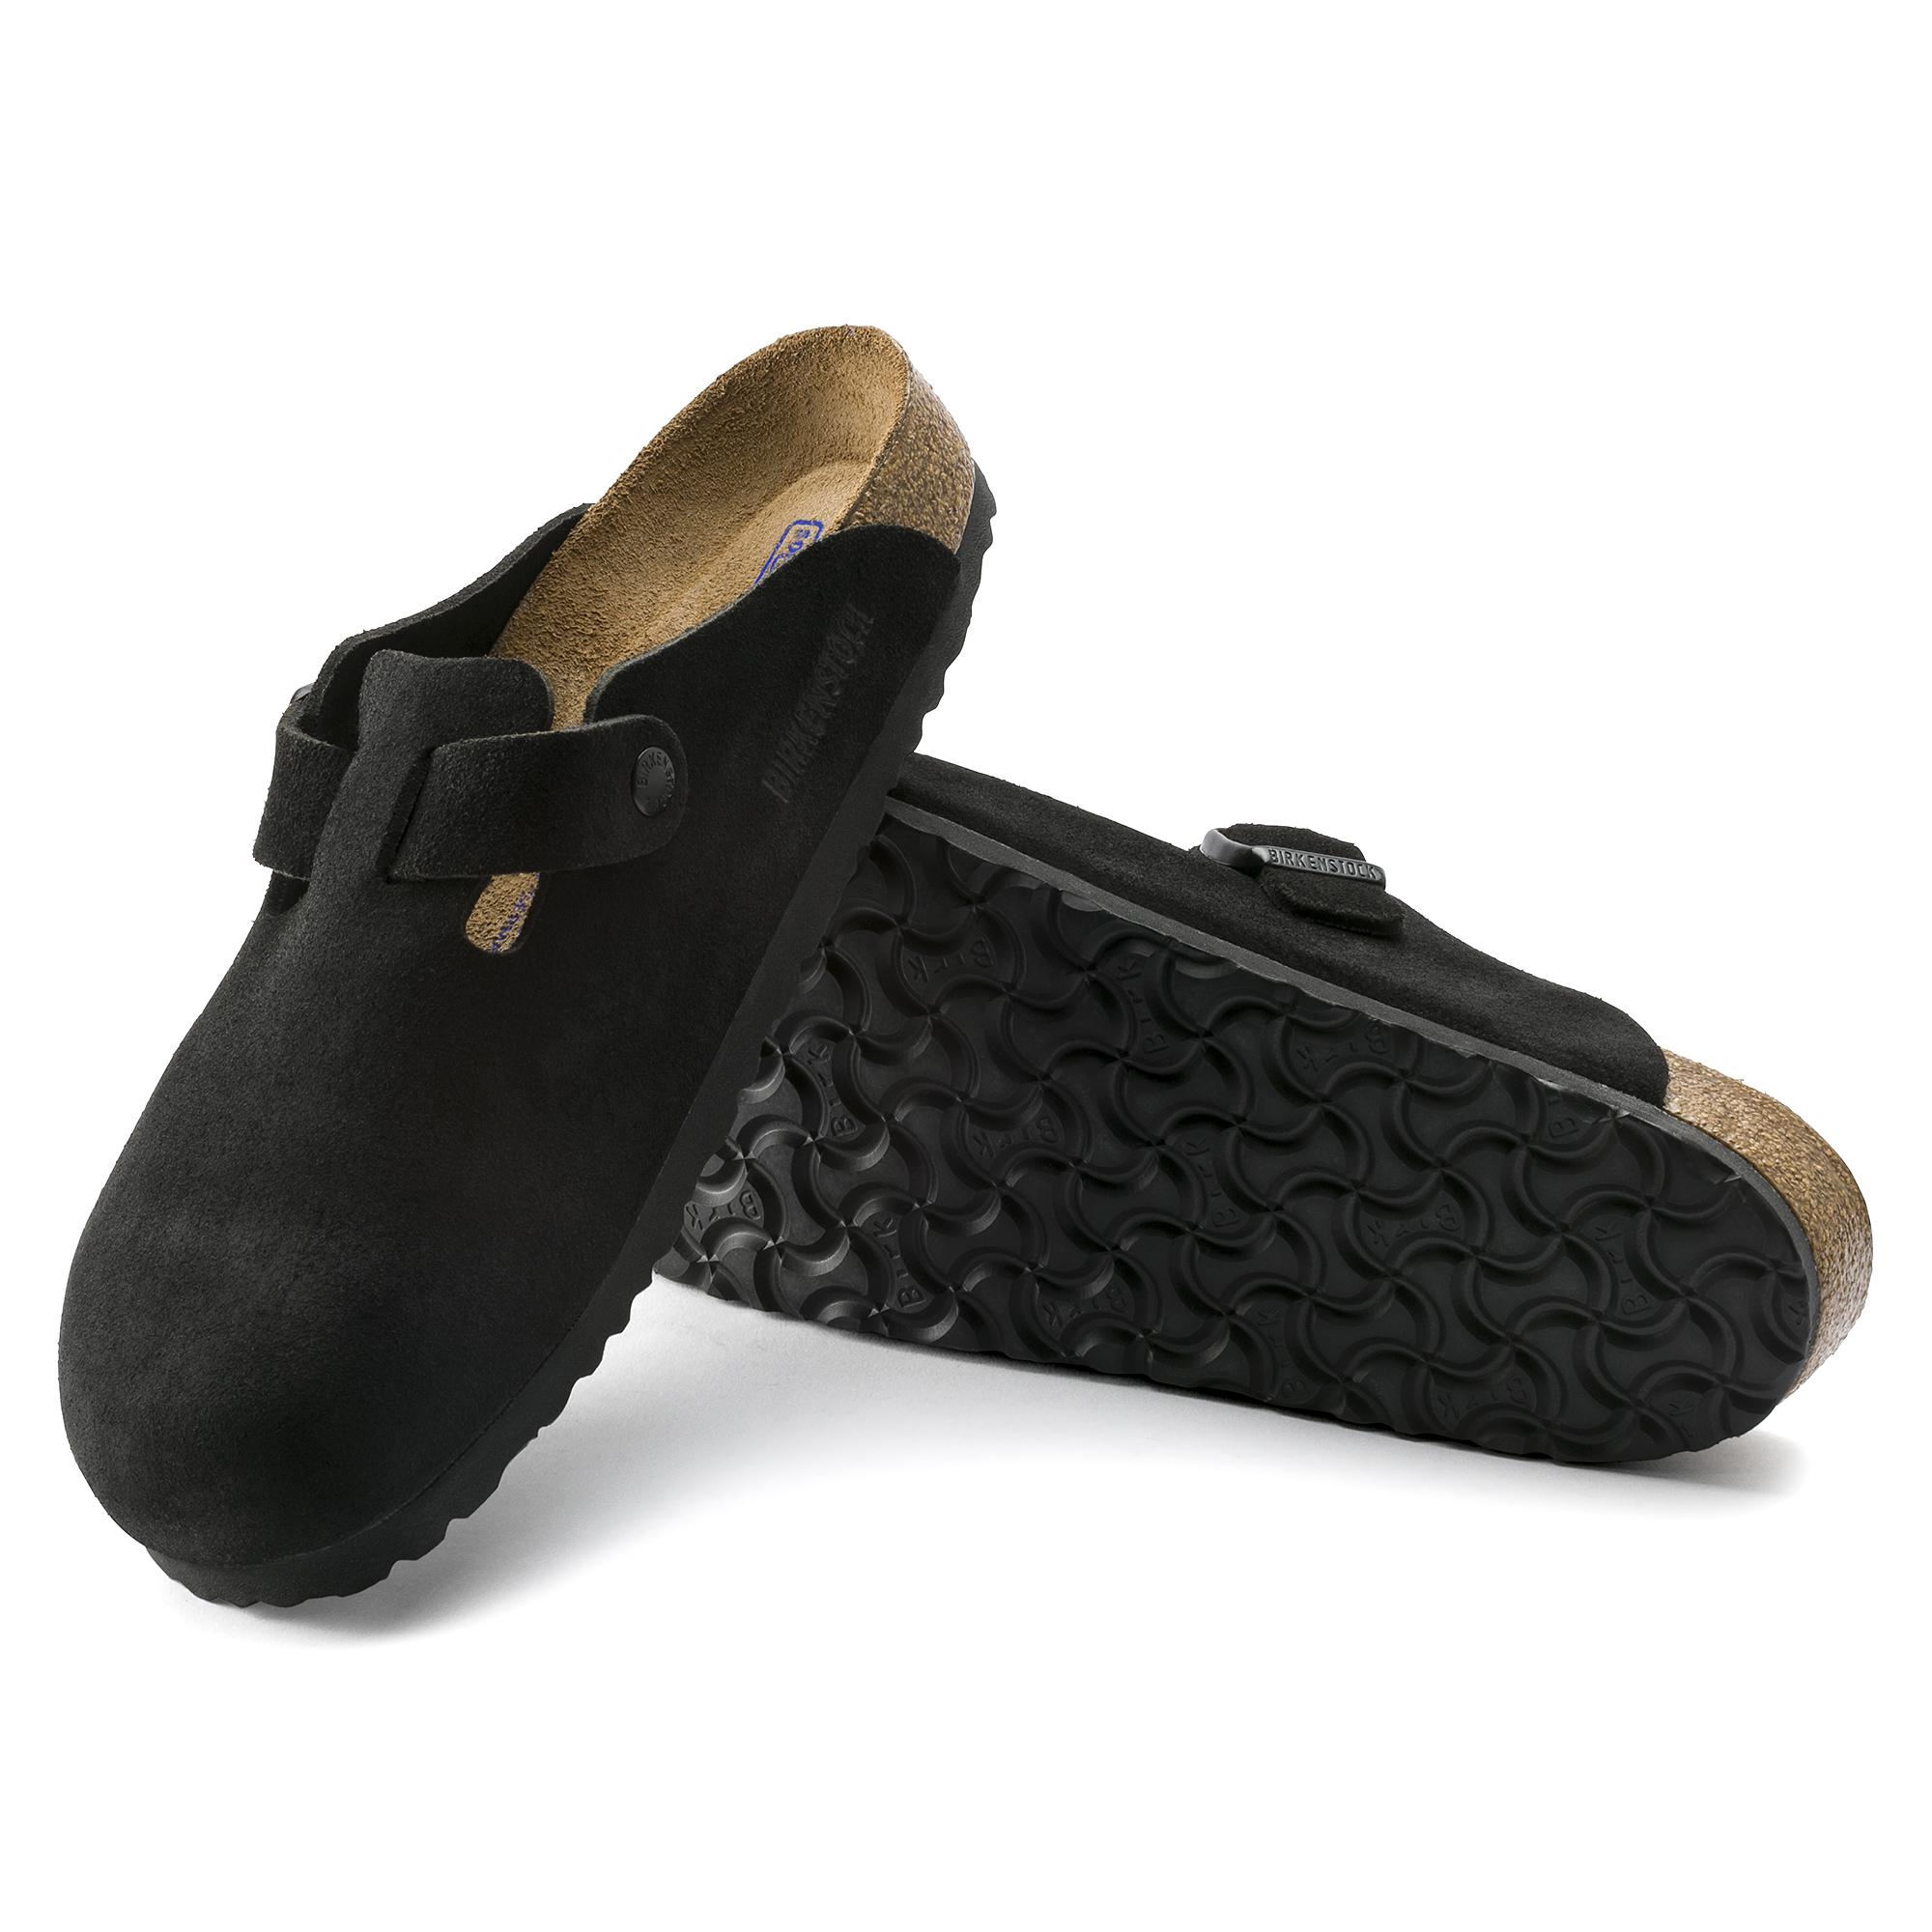 Boston Suede Leather Black | shop